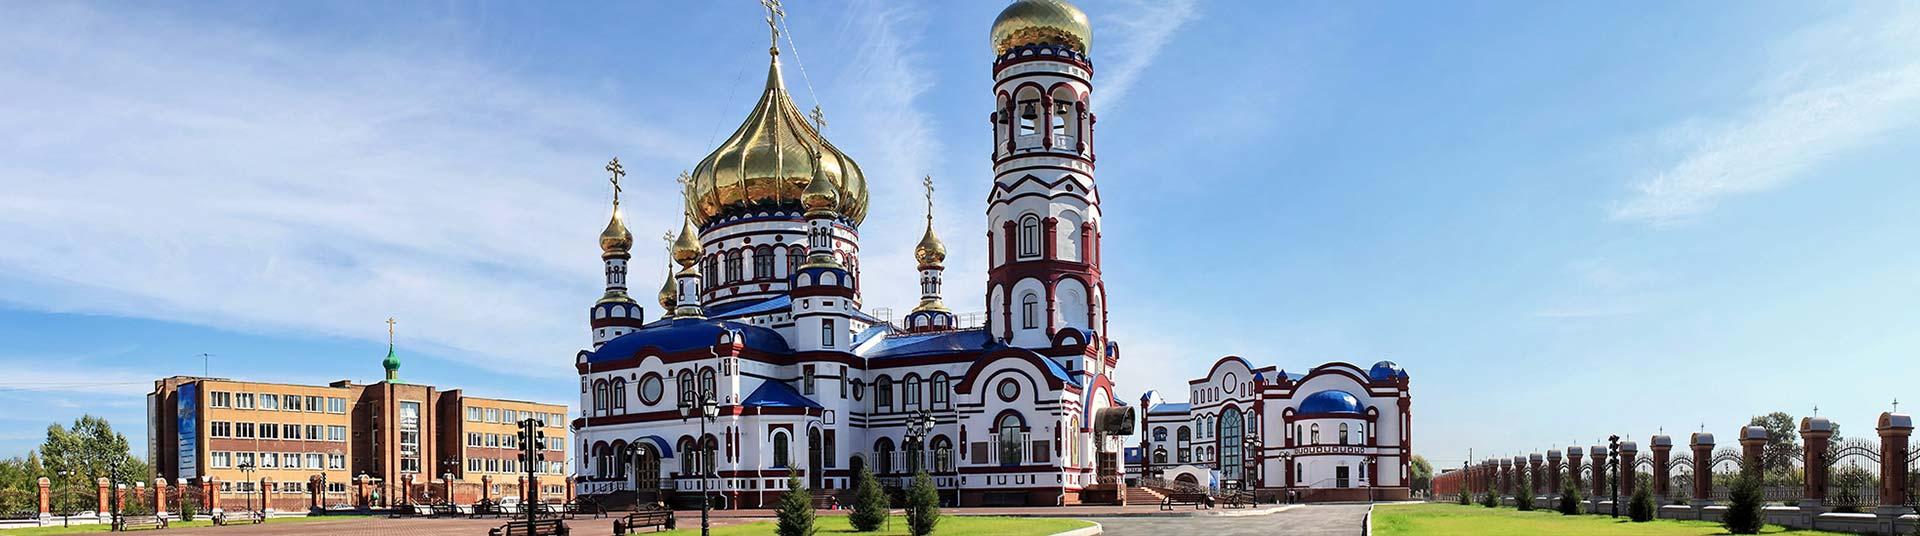 Филиал в Новокузнецке